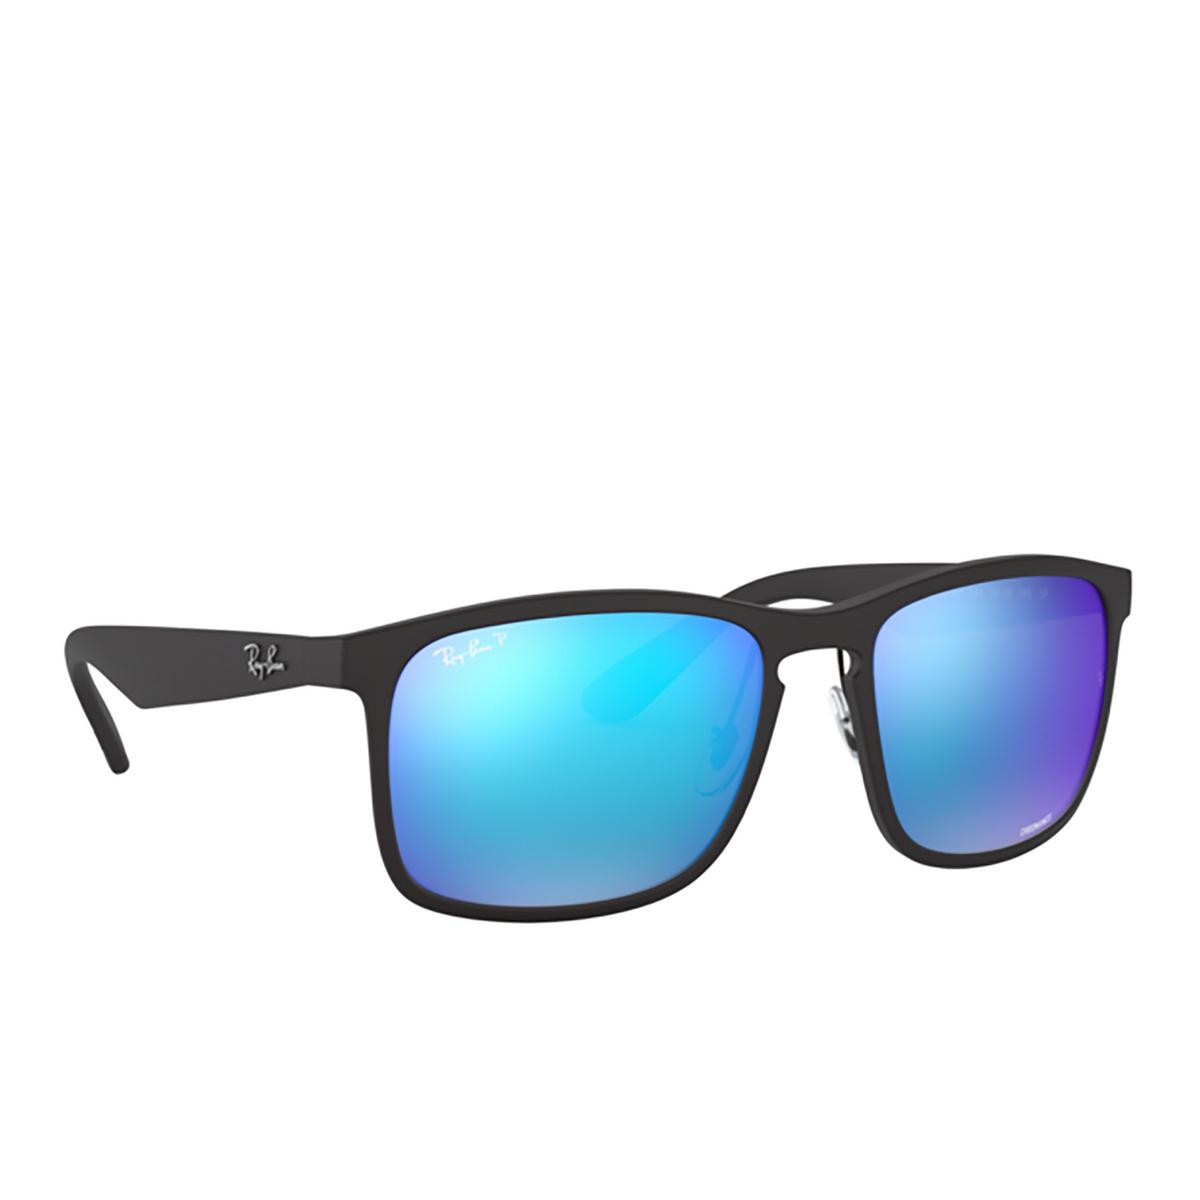 Ray-Ban® Square Sunglasses: RB4264 color Matte Black 601SA1 - 2/3.